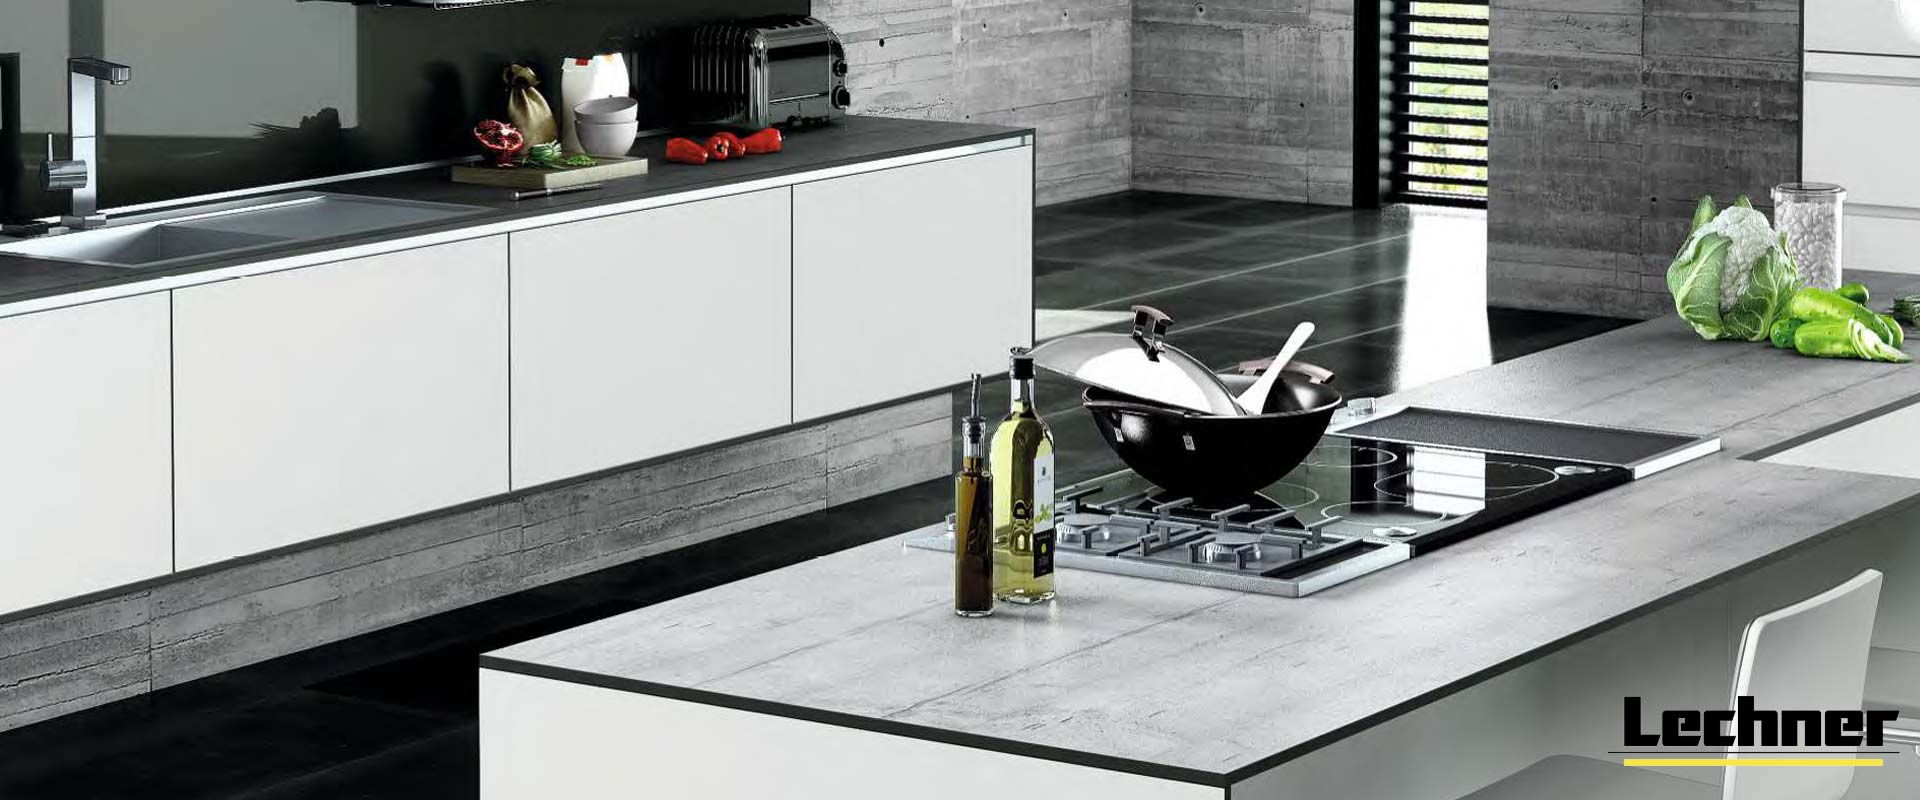 domeyer m bel und k chen lechner. Black Bedroom Furniture Sets. Home Design Ideas